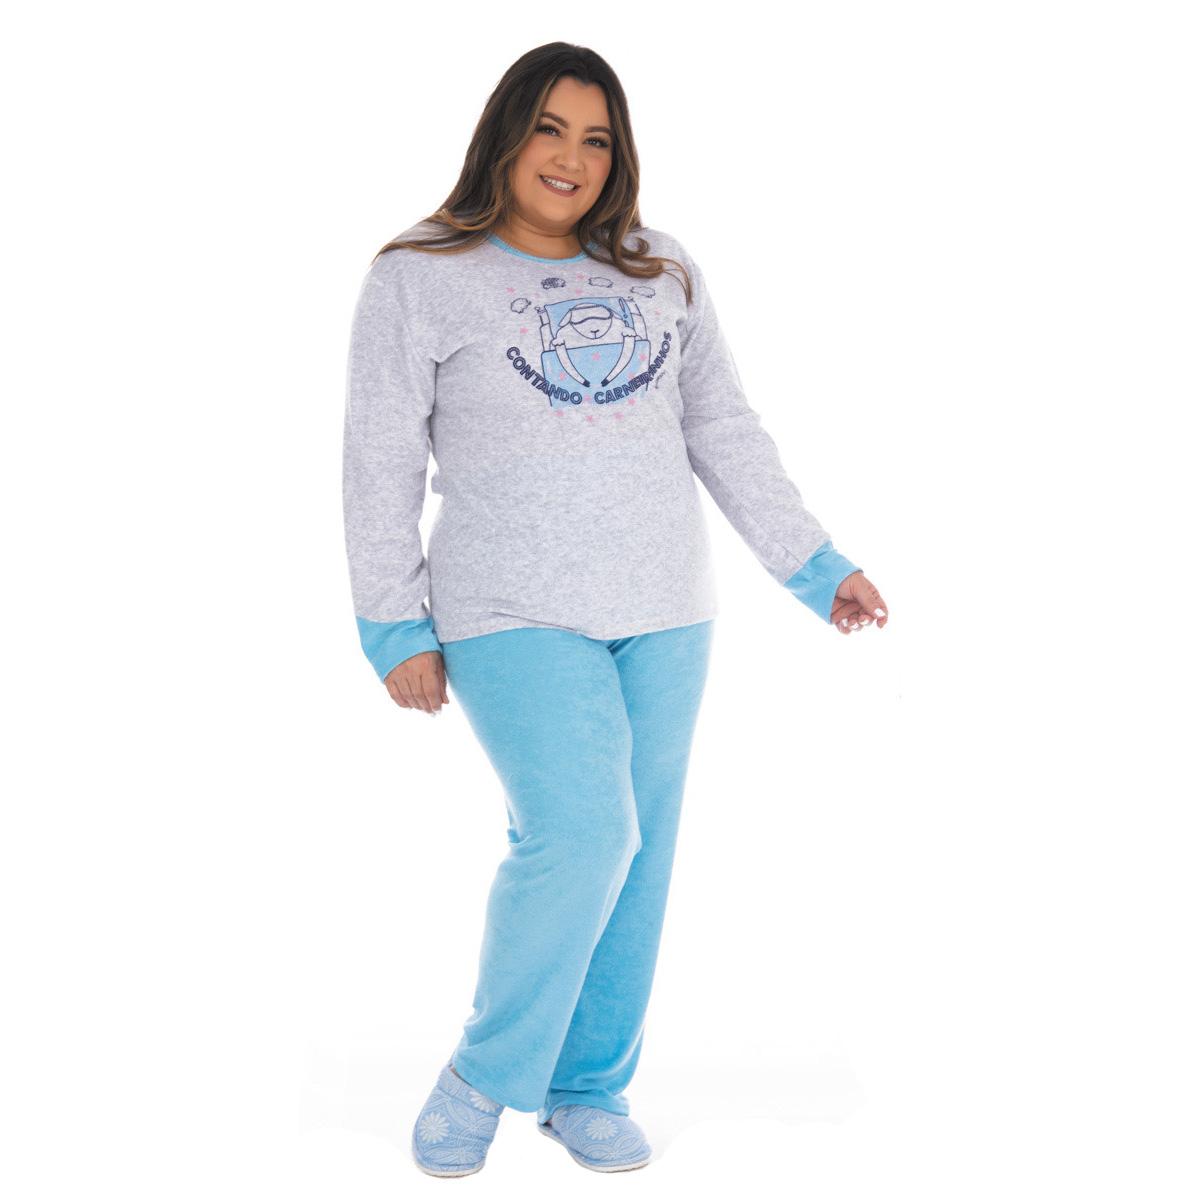 Pijama feminino de inverno plush PLUS SIZE SOPHIA Victory